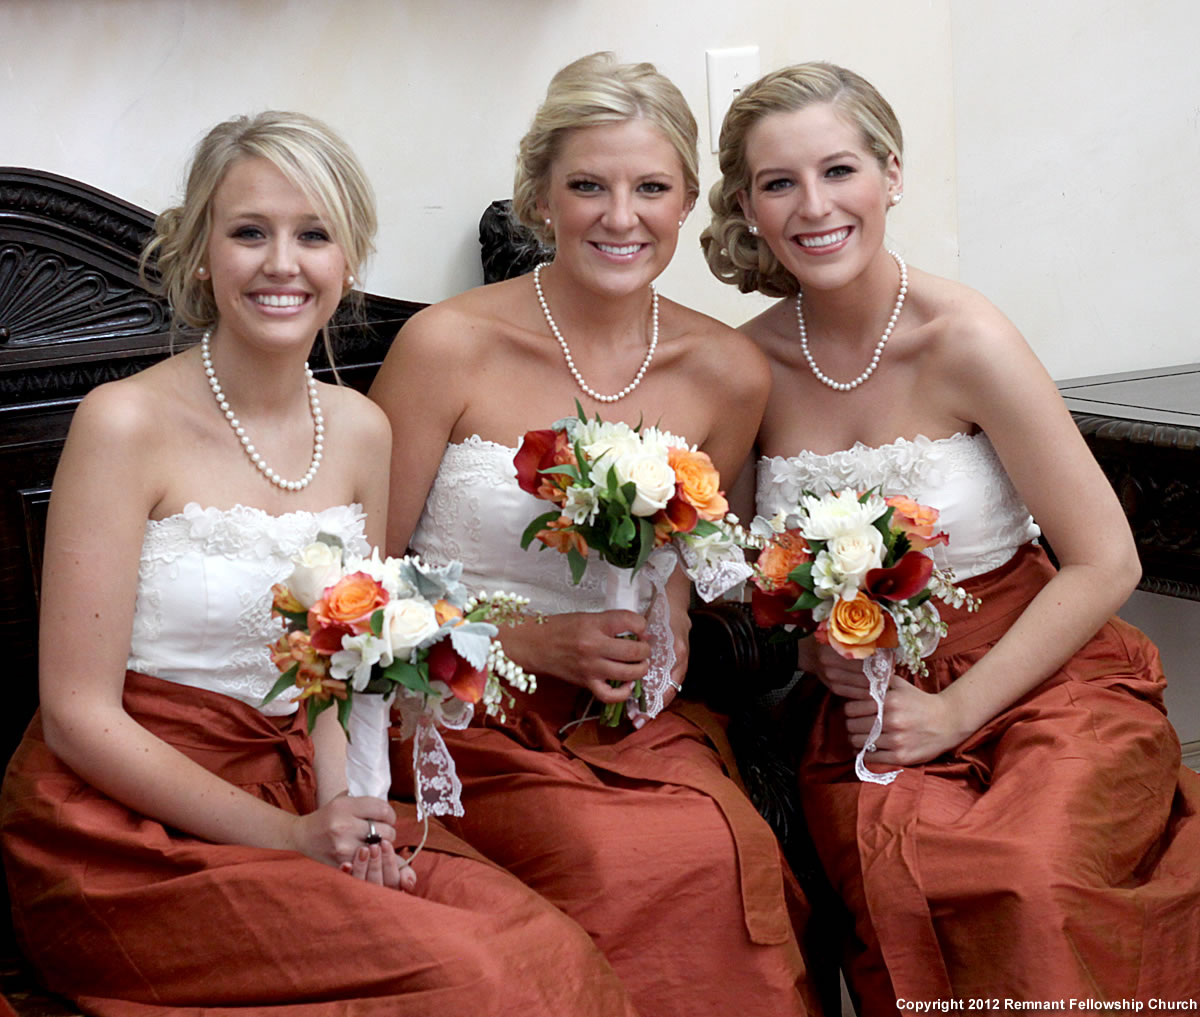 Orange remnant fellowship weddings fall bridesmaid dresses lace and burnt orange gadkemchaney covenant wedding ombrellifo Images